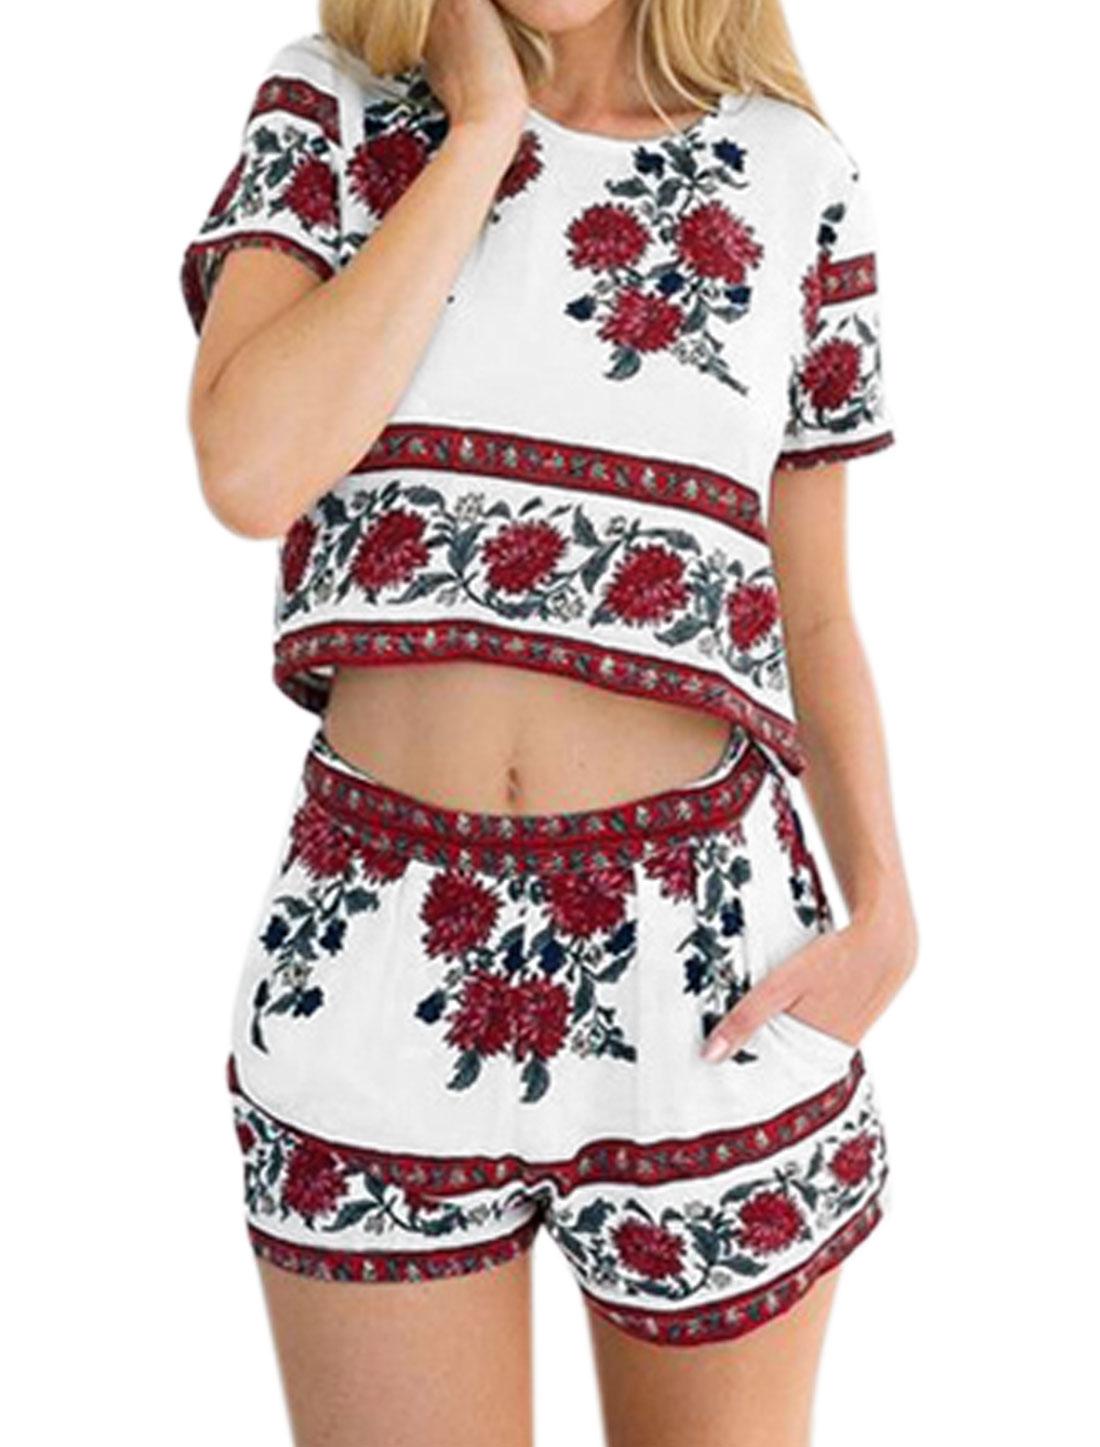 Women Floral Prints Short Sleeve Crop Top w Elastic Waist Pockets Shorts Set White M